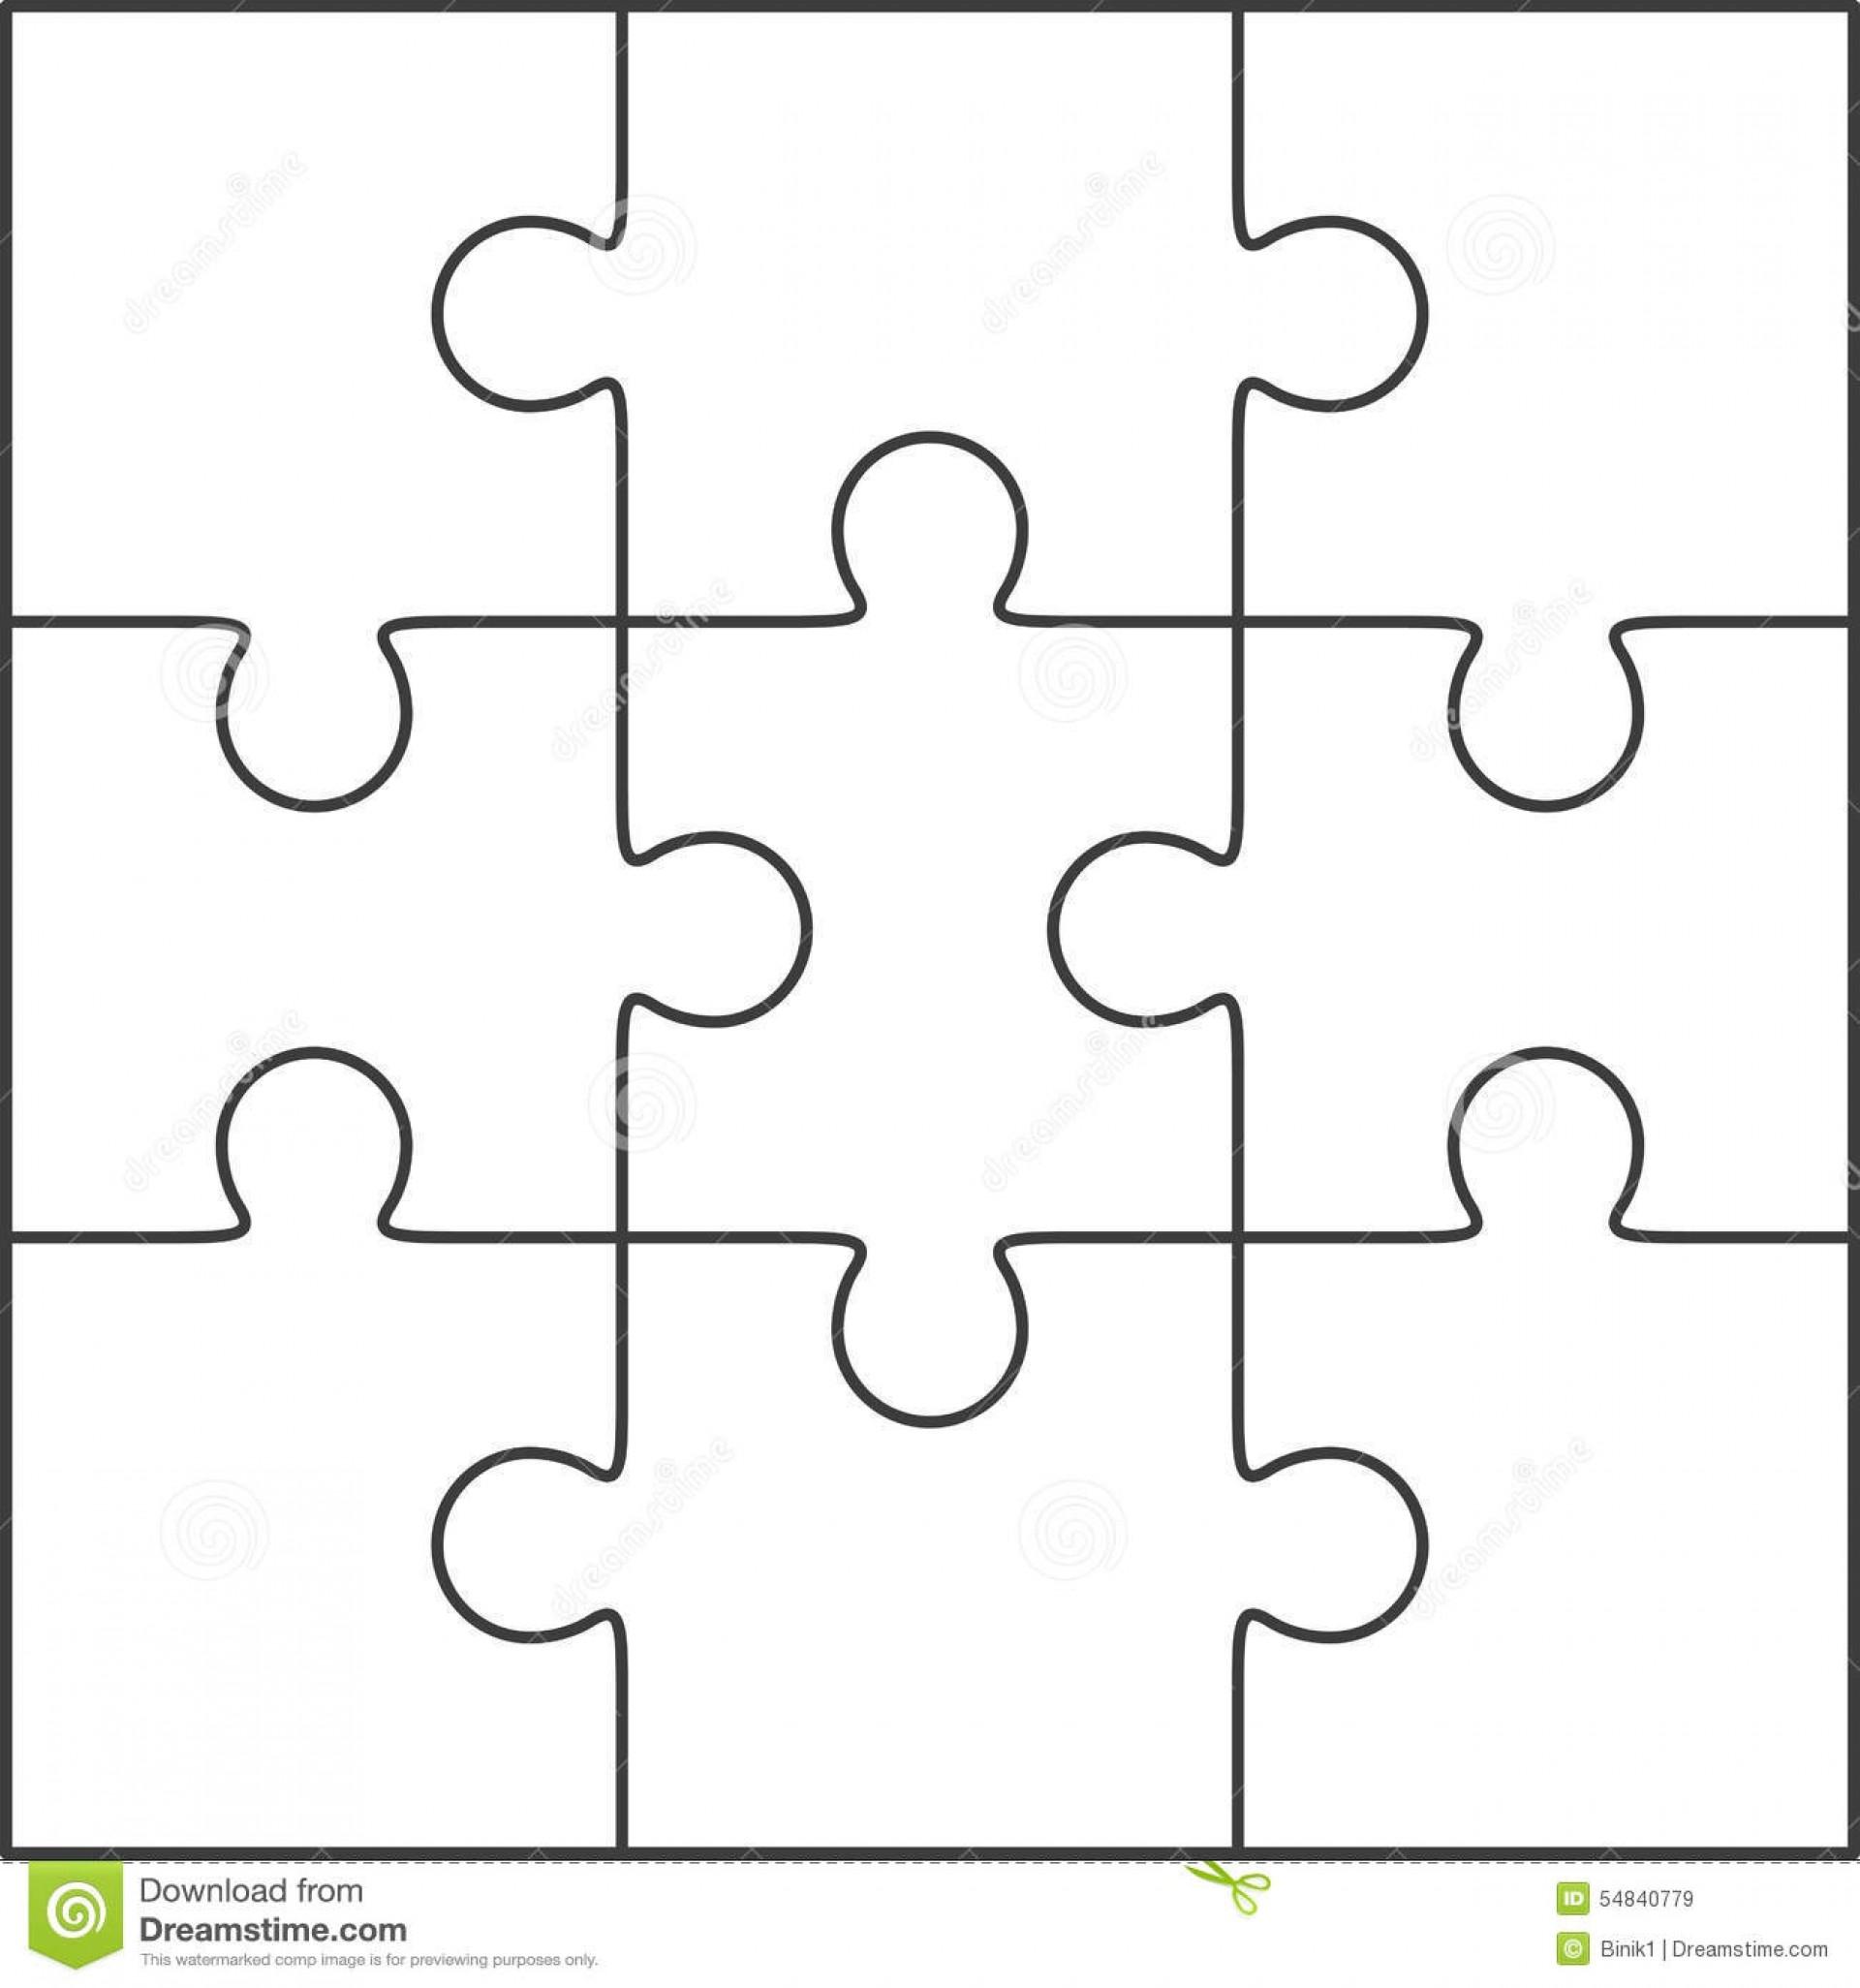 010 Jig Saw Puzzle Template Jigsaw Blank Twenty Pieces Simple Best - Printable Jigsaw Puzzle Templates Blank